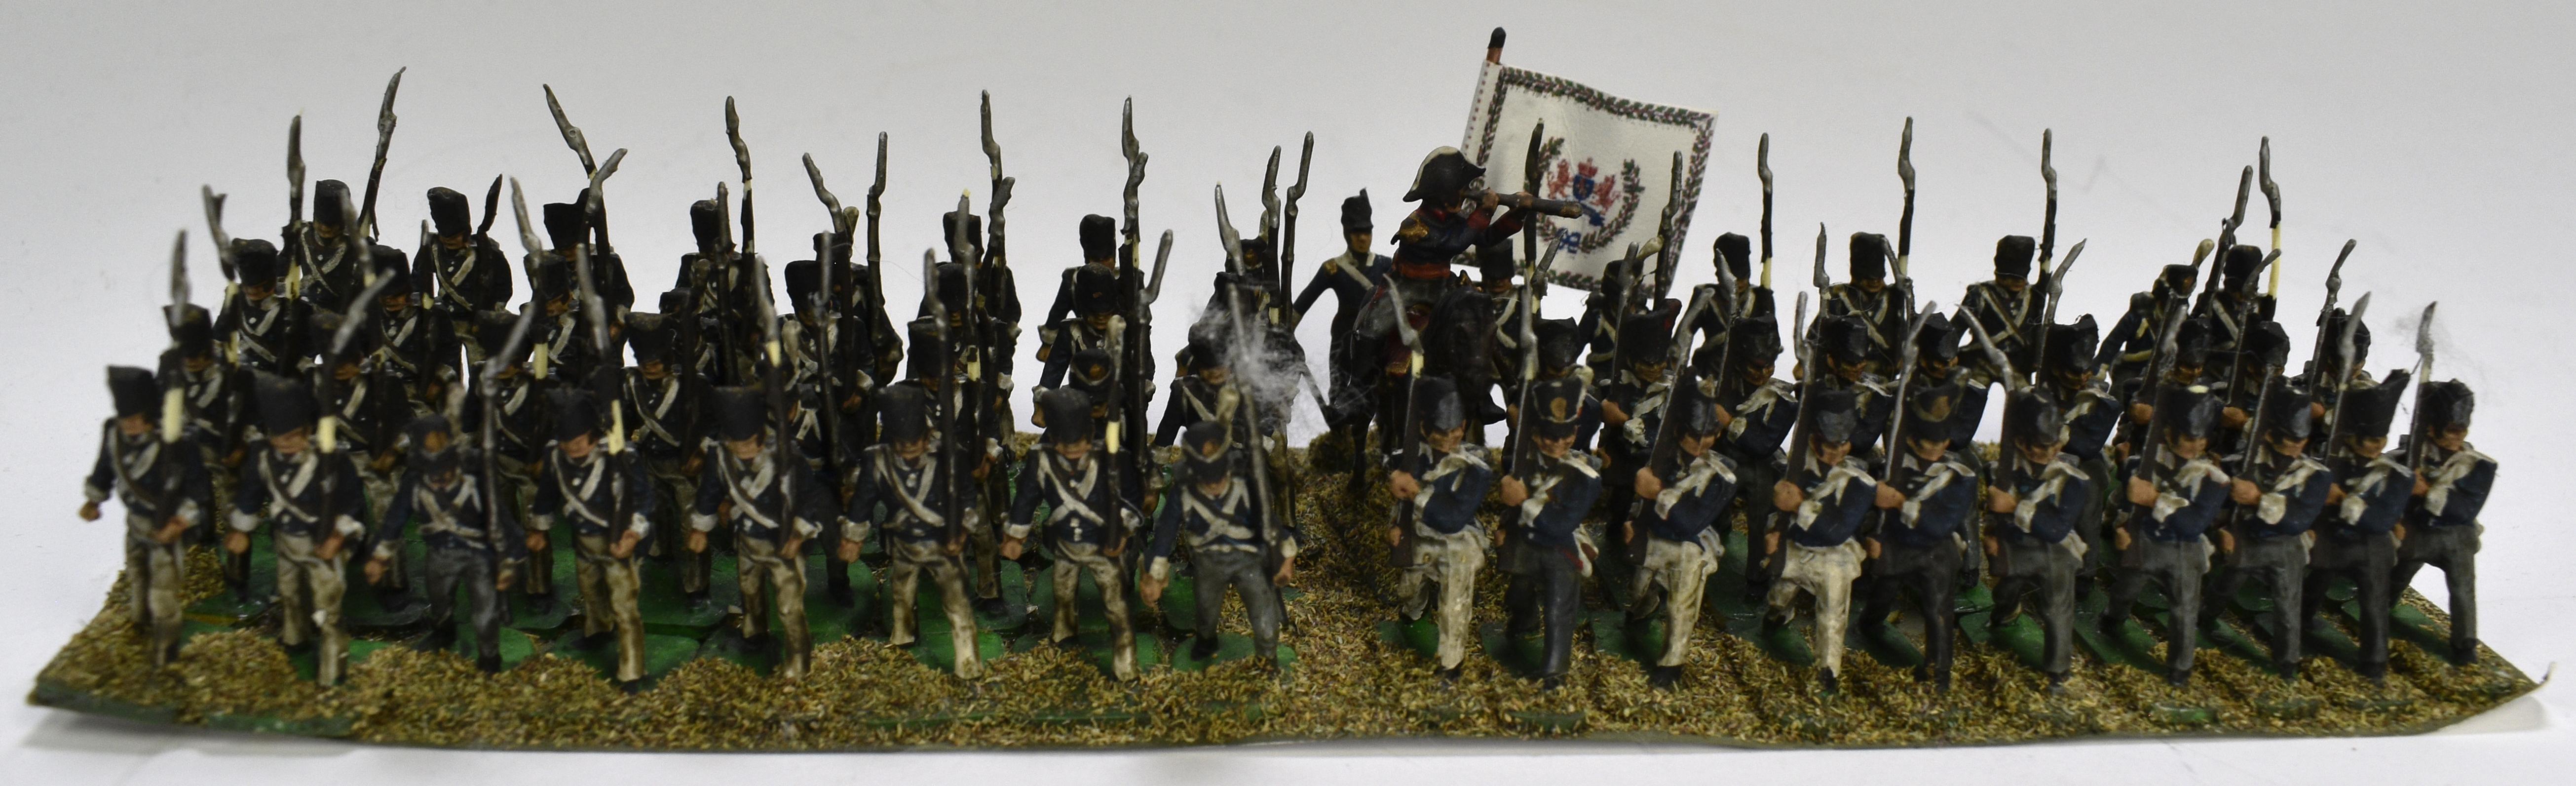 Lot 37849 - varia (im briefmarkenkatalog)  -  Auktionshaus Christoph Gärtner GmbH & Co. KG Sale #44 Collections Germany